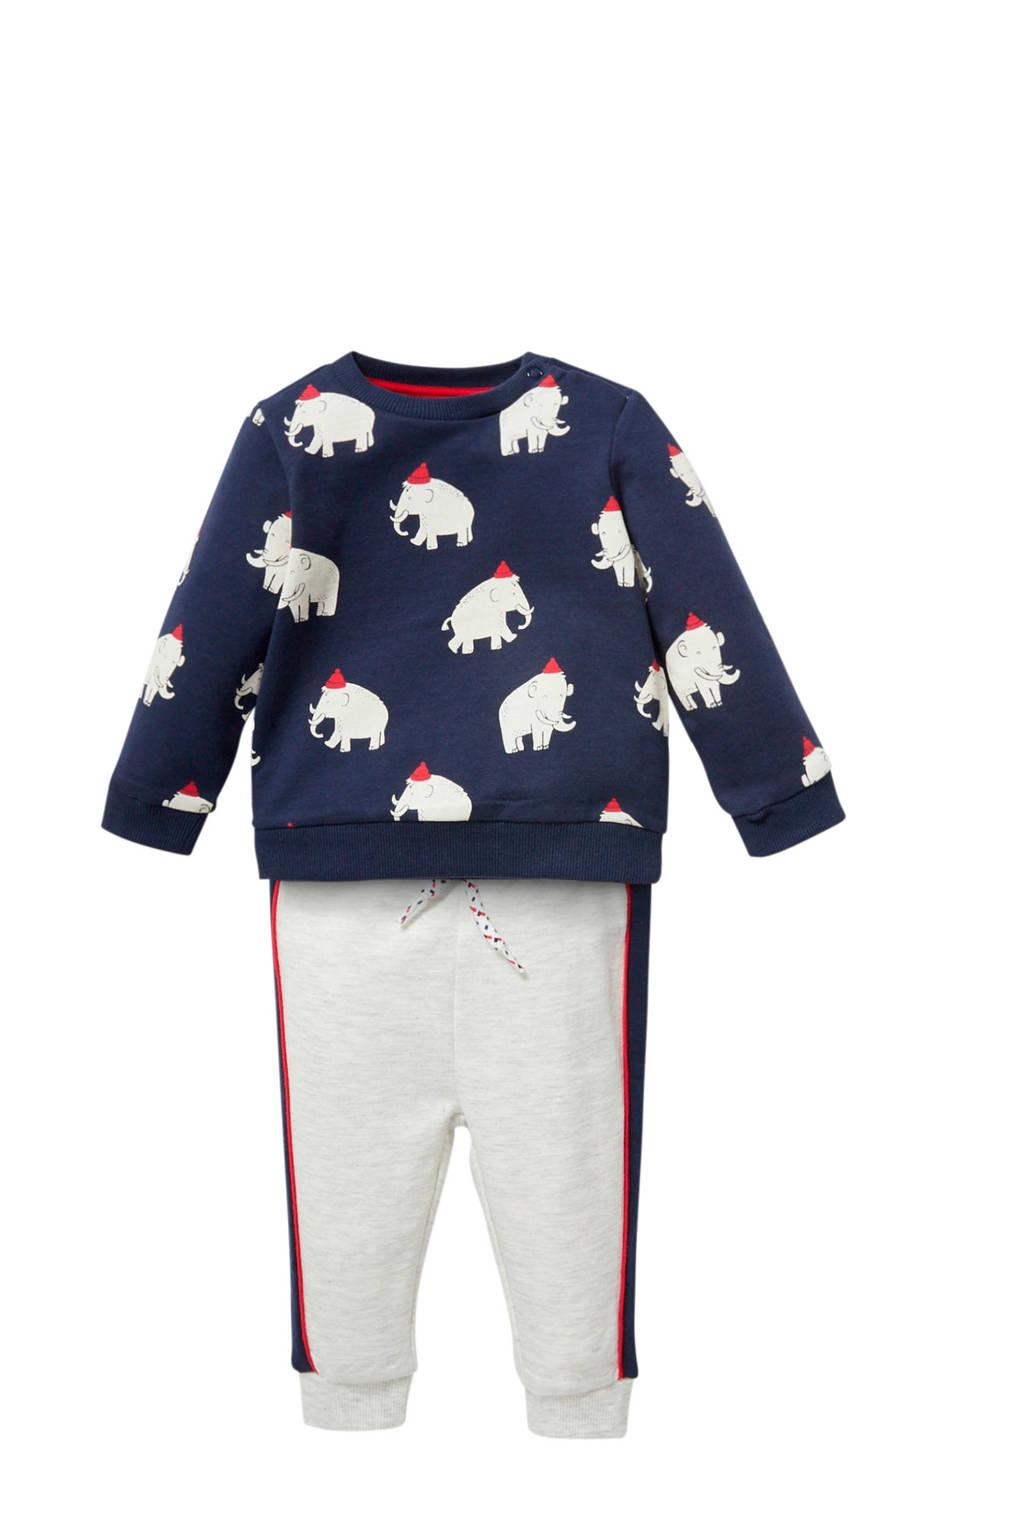 C&A Baby Club sweater + joggingbroek donkerblauw/beige/rood, Donkerblauw